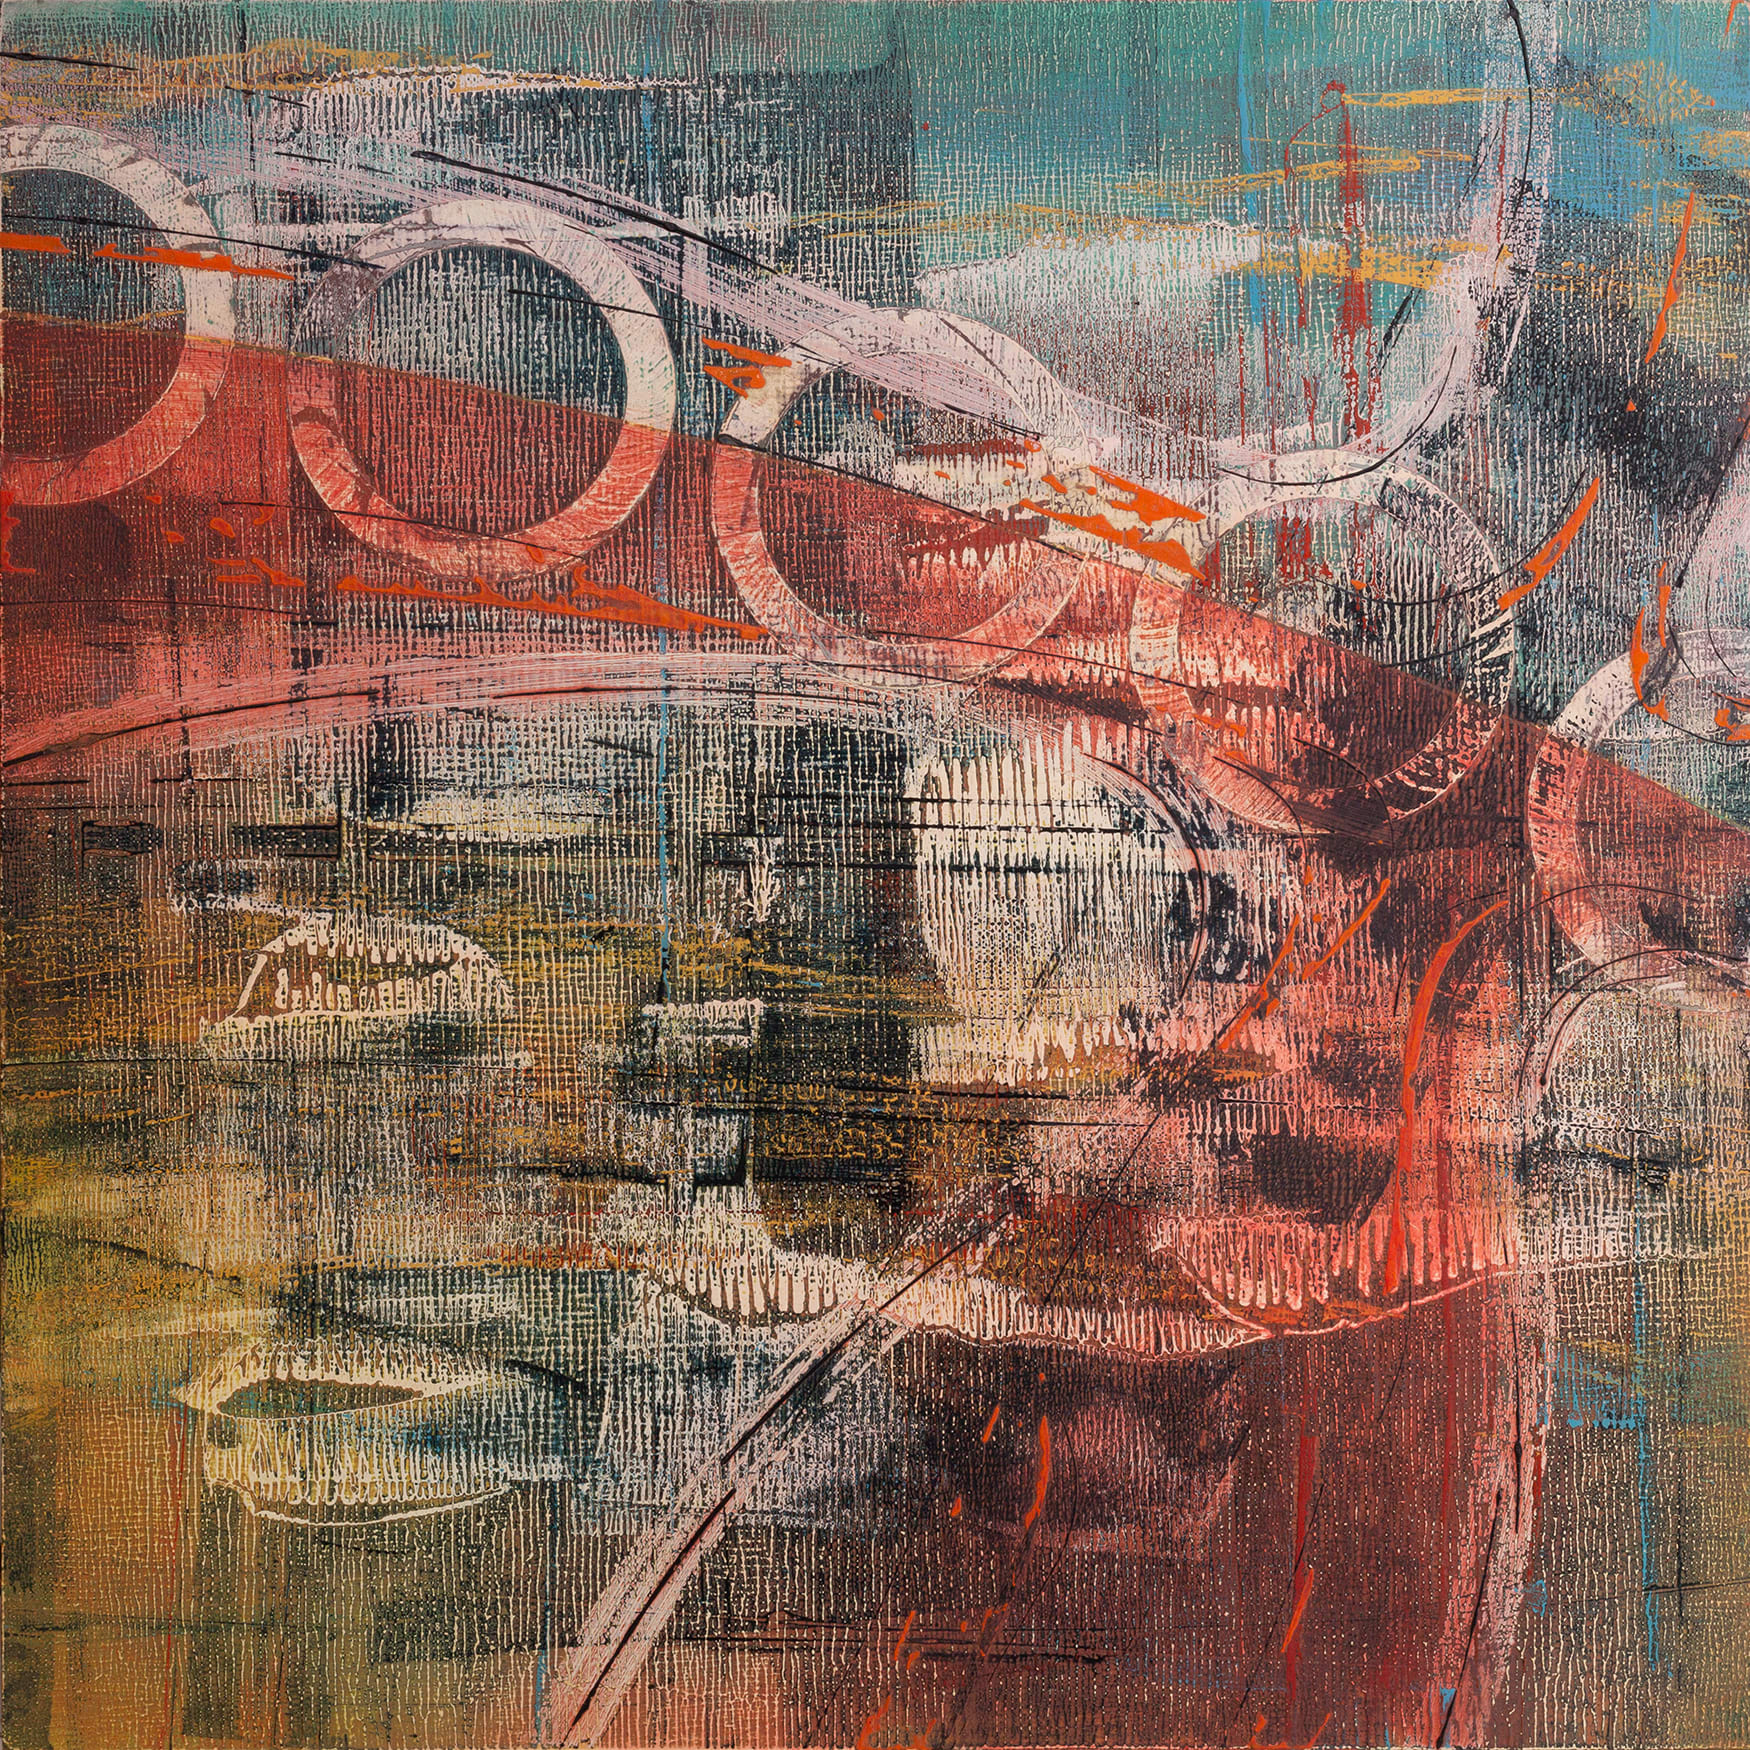 "<span class=""link fancybox-details-link""><a href=""/artists/218-ian-harrold/works/6960-ian-harrold-penumbra-05-2020/"">View Detail Page</a></span><div class=""artist""><strong>Ian Harrold</strong></div> <div class=""title""><em>Penumbra #05</em>, 2020</div> <div class=""signed_and_dated"">signed and labelled</div> <div class=""medium"">Oil on board</div> <div class=""dimensions"">h. 40 x 40 cm </div><div class=""price"">£720.00</div><div class=""copyright_line"">Copyright The Artist</div>"